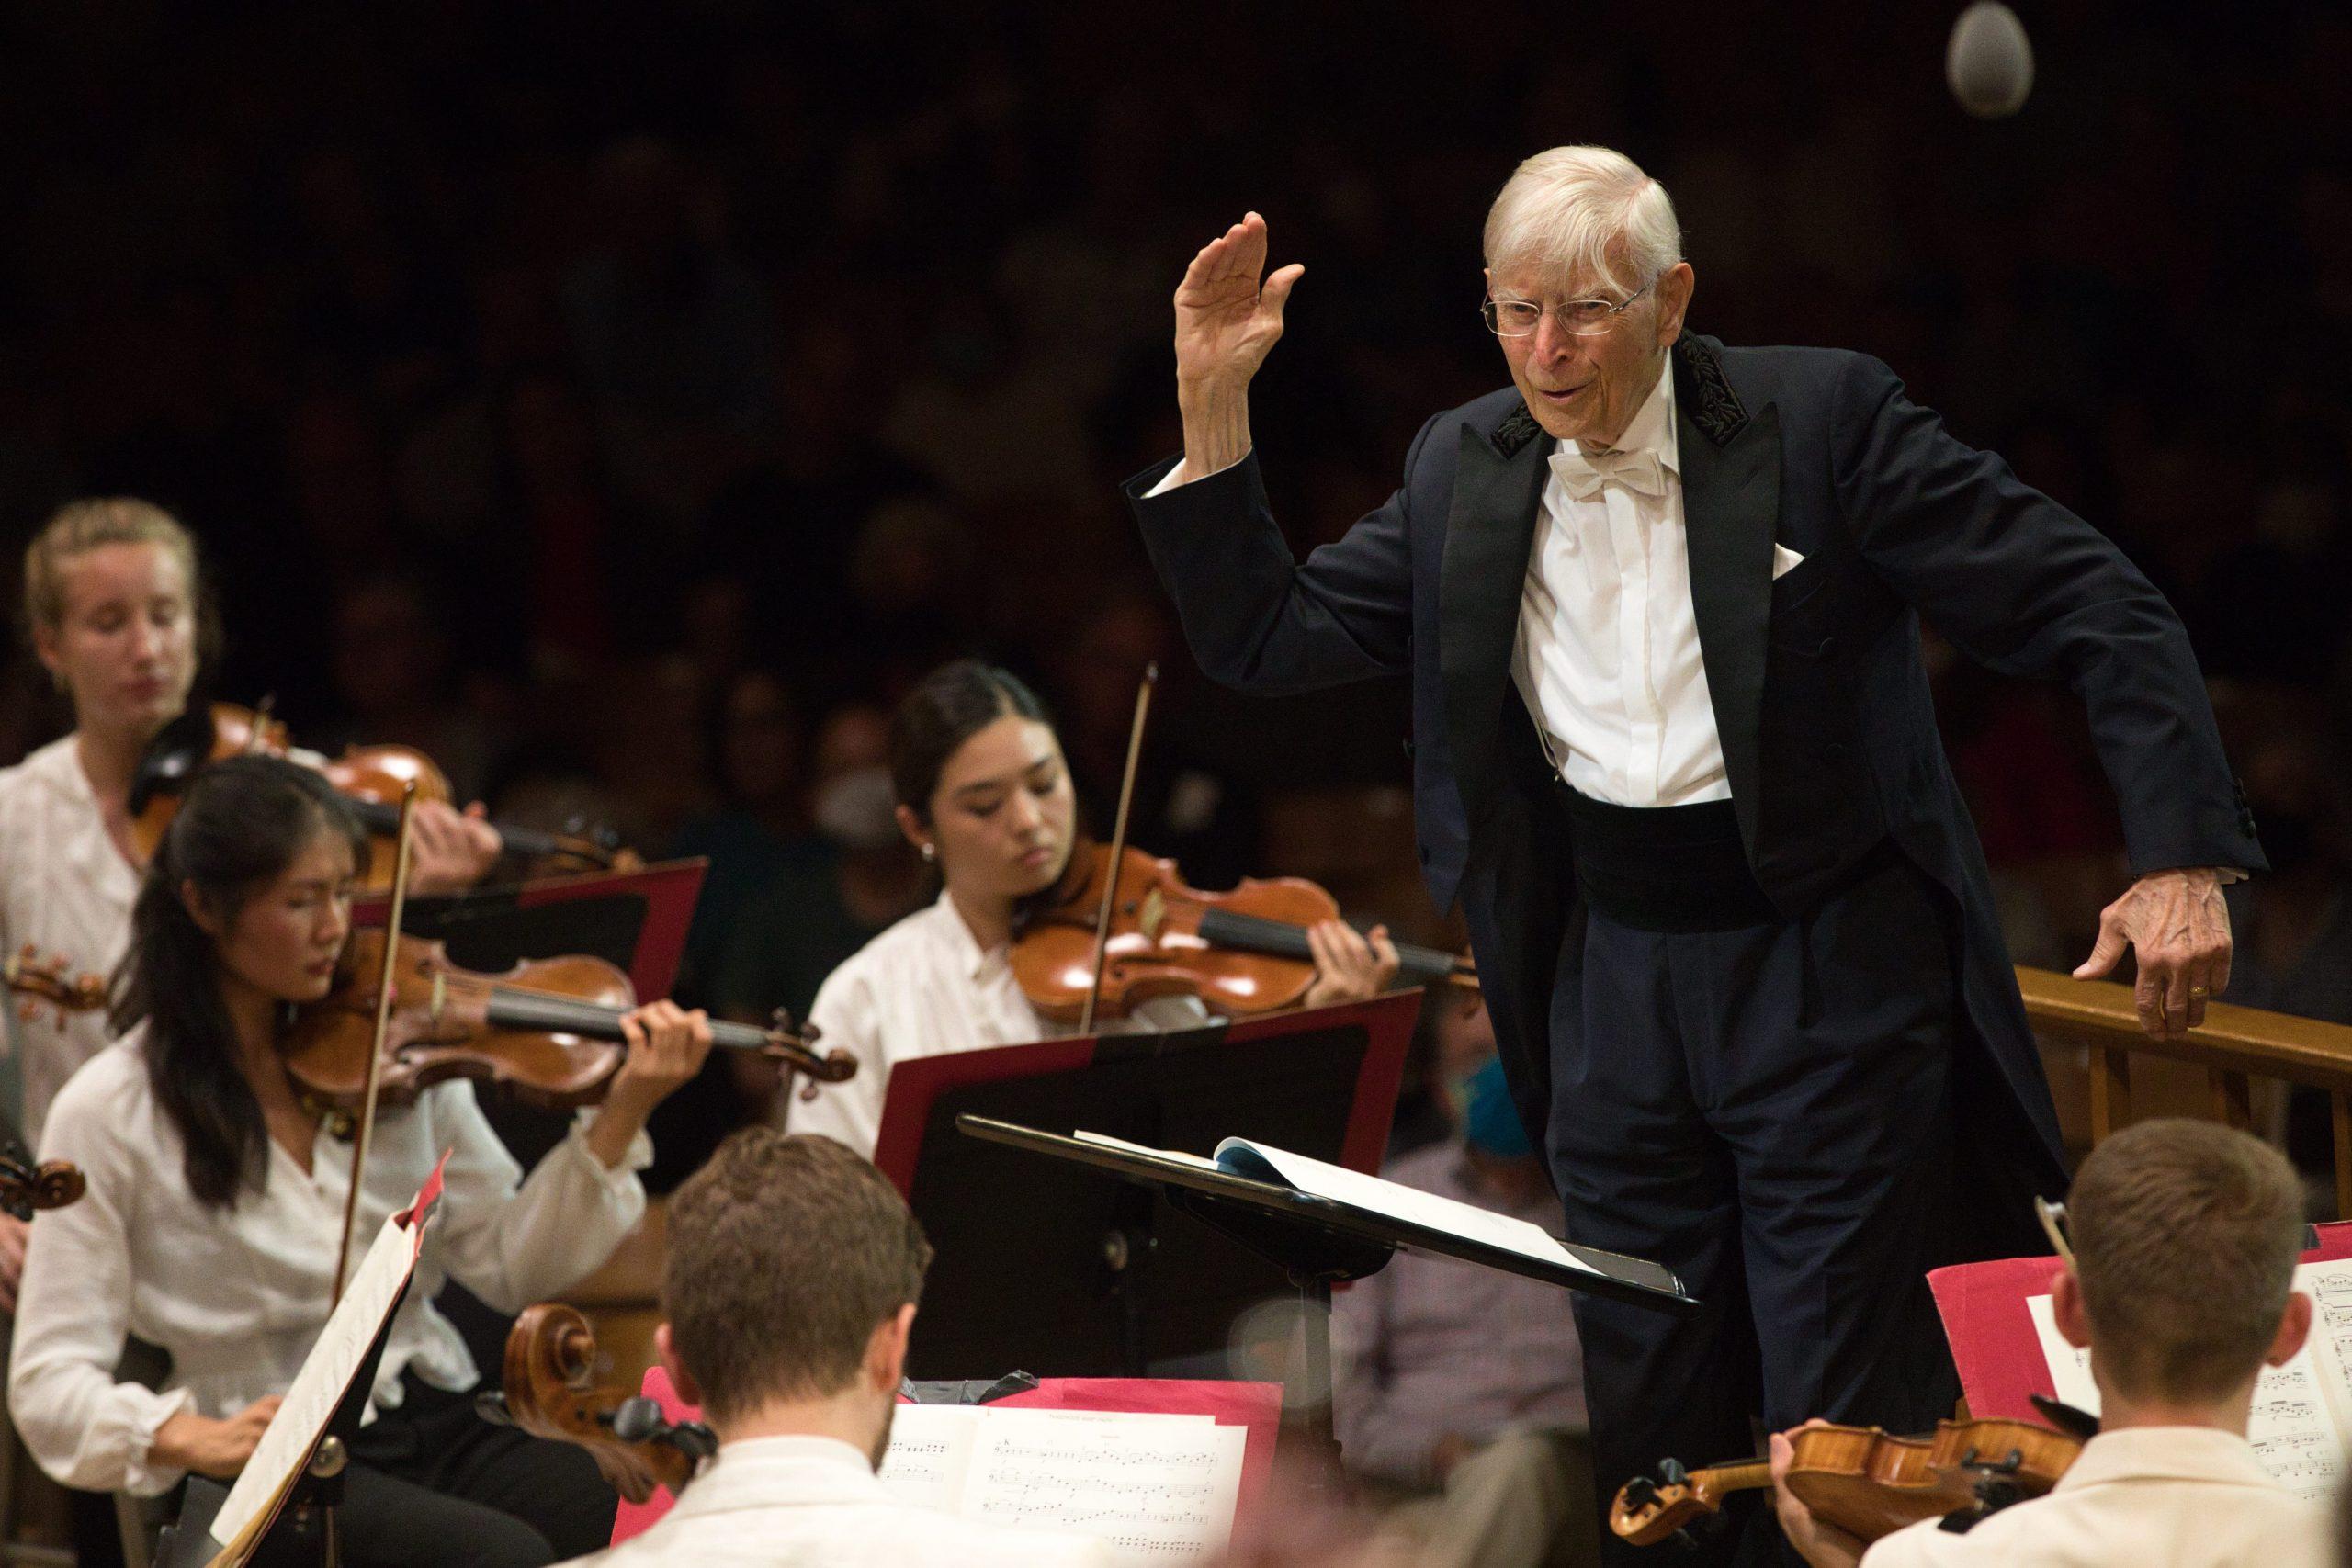 Blomstedt Flourishes at Tanglewood: Mendelssohn, Mozart, Brahms